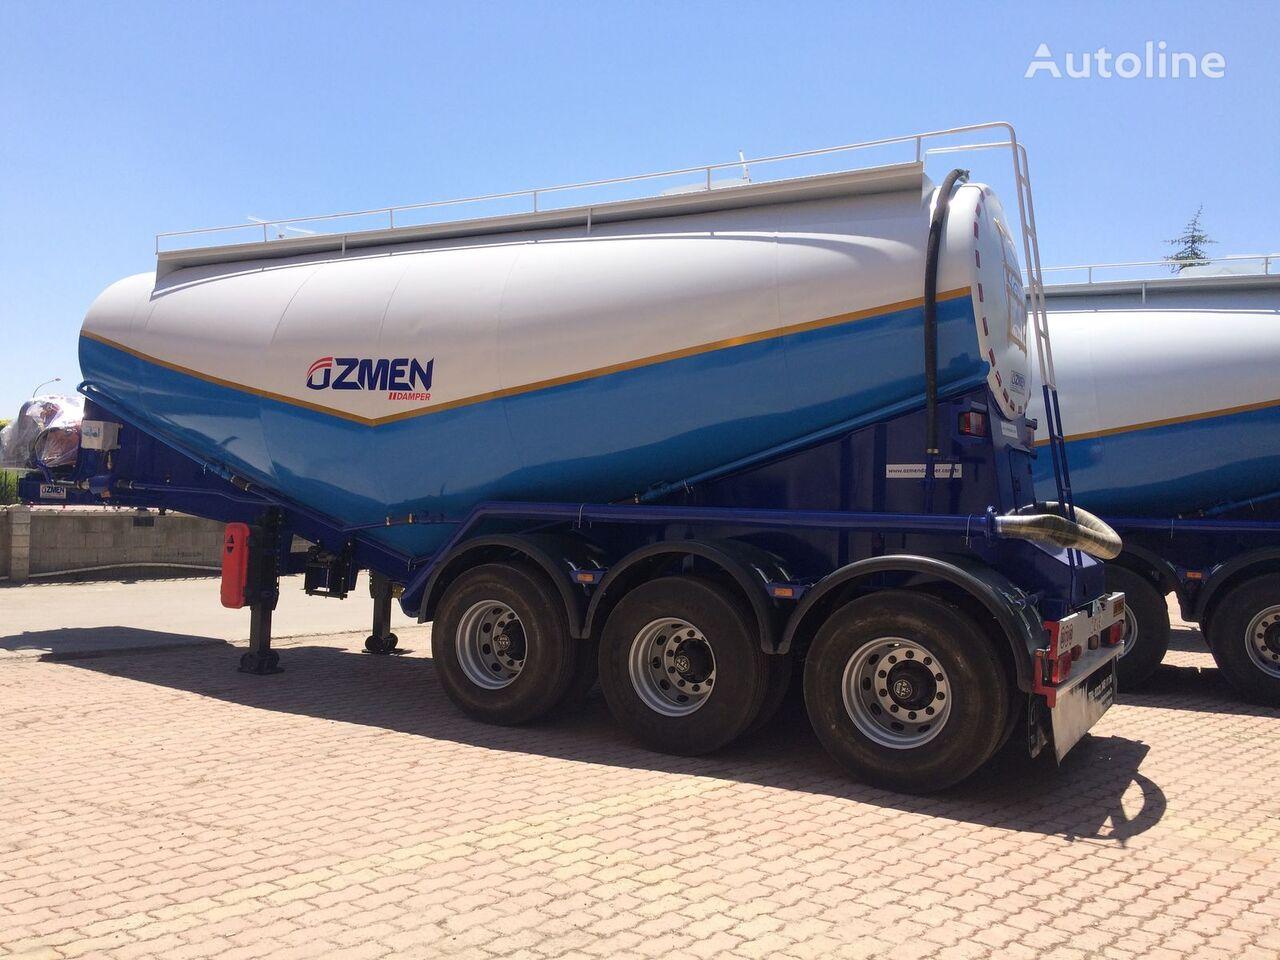 new Ozmen Damper 27-34 m3 Cement Bulk Semi Trailer - Electrical Engine cement tank trailer